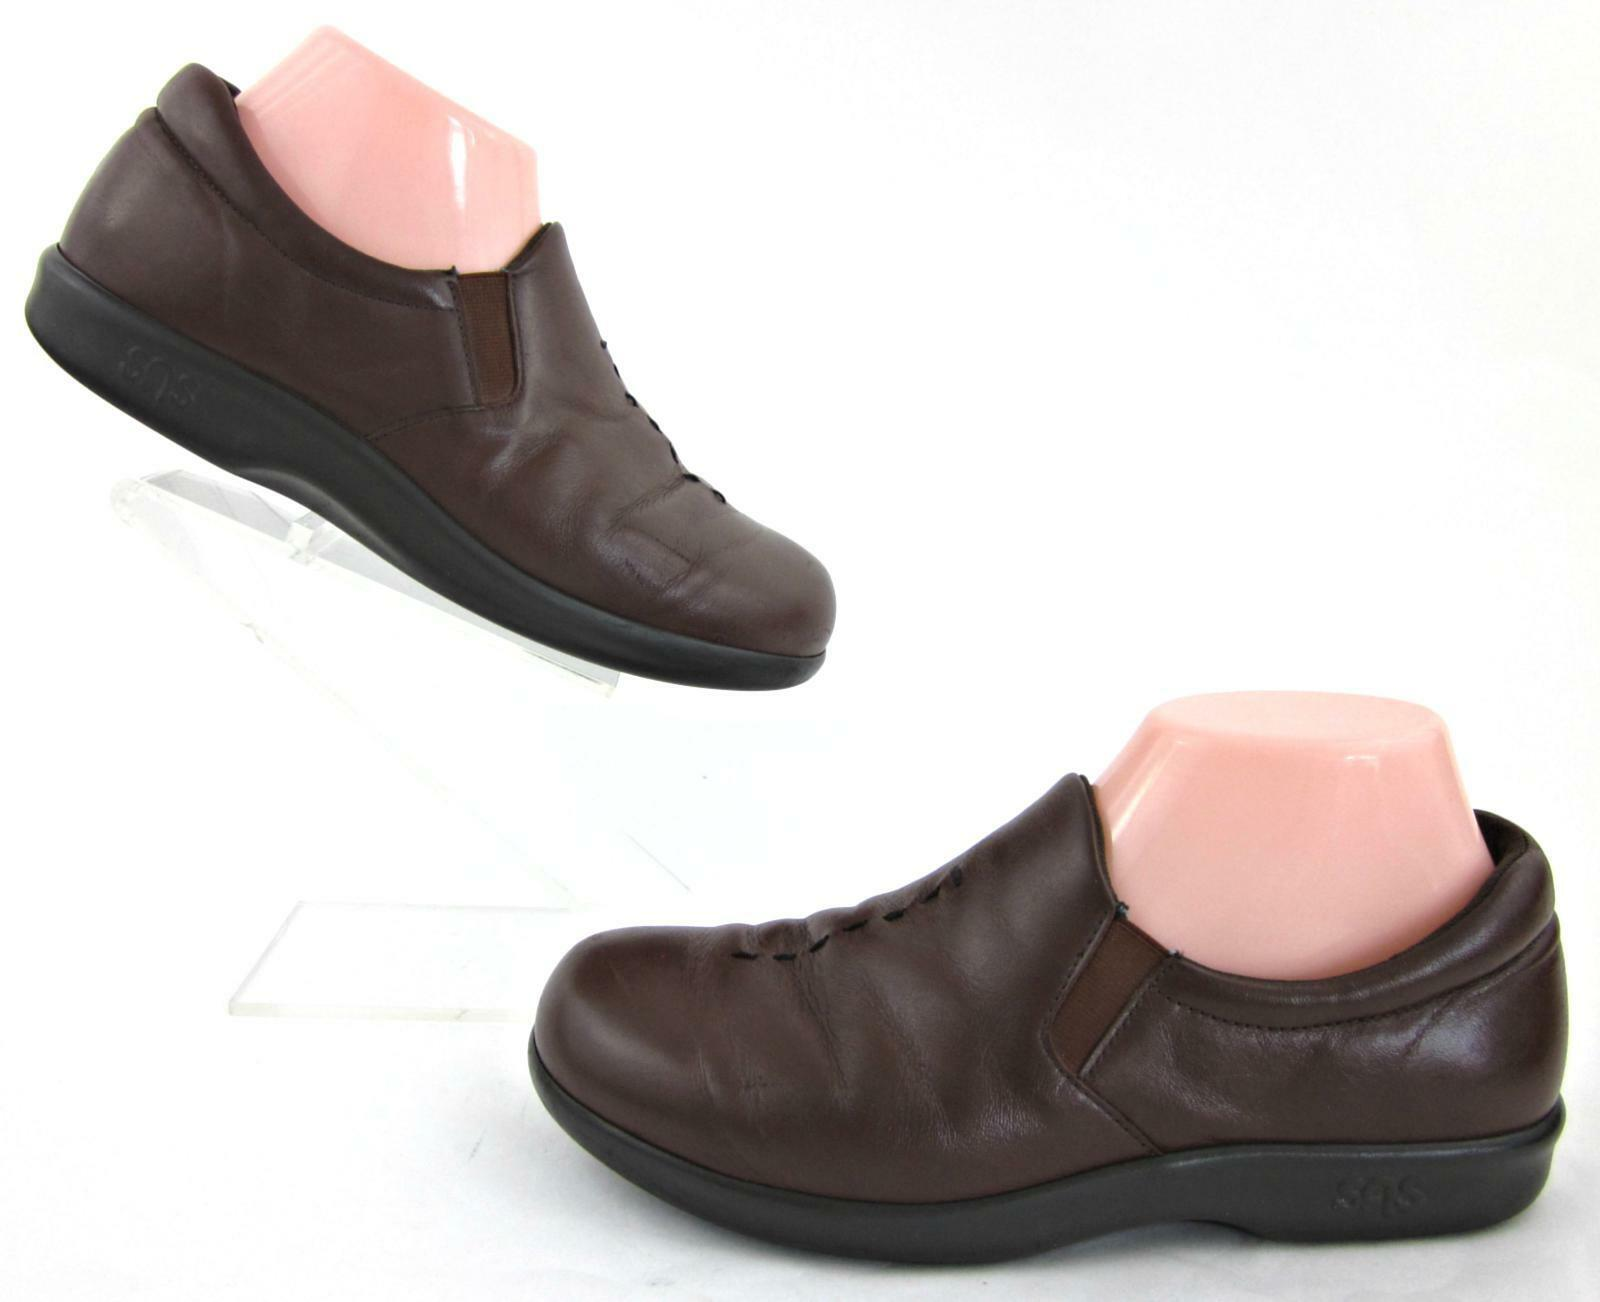 SAS 'Viva' damen Slip On Comfort schuhe braun Leather US 7M